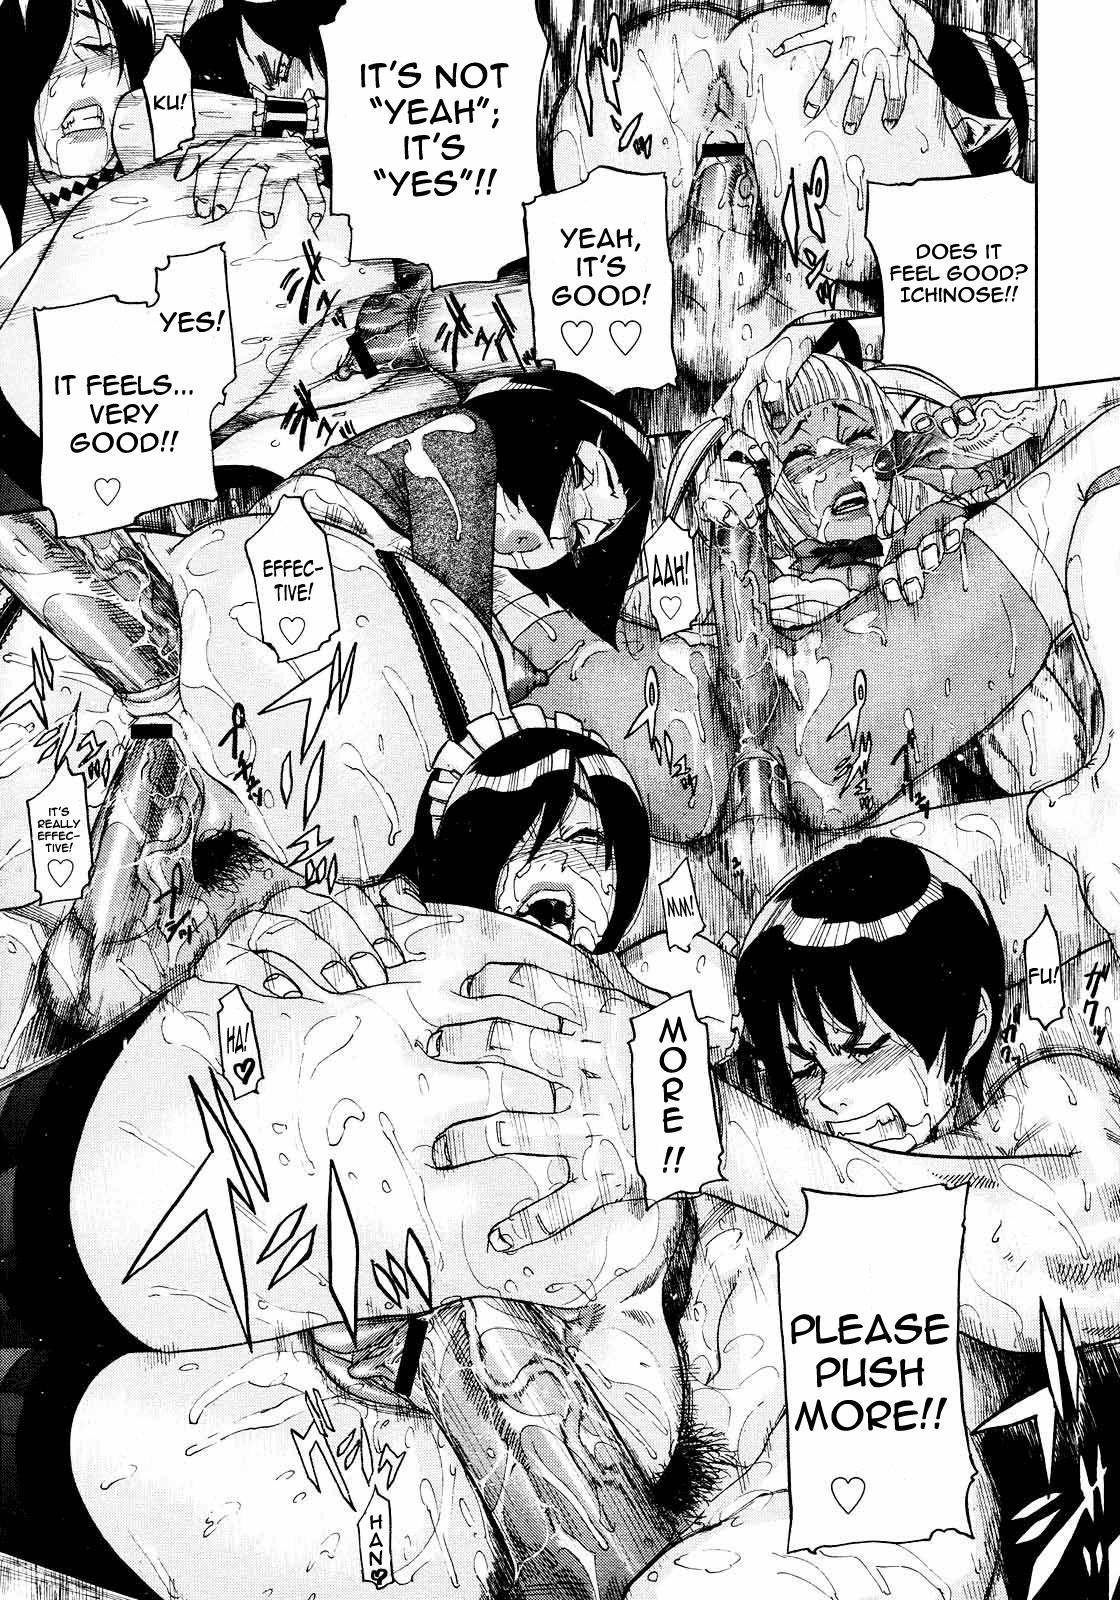 PM03:40 Takuhai Hiyori. 22